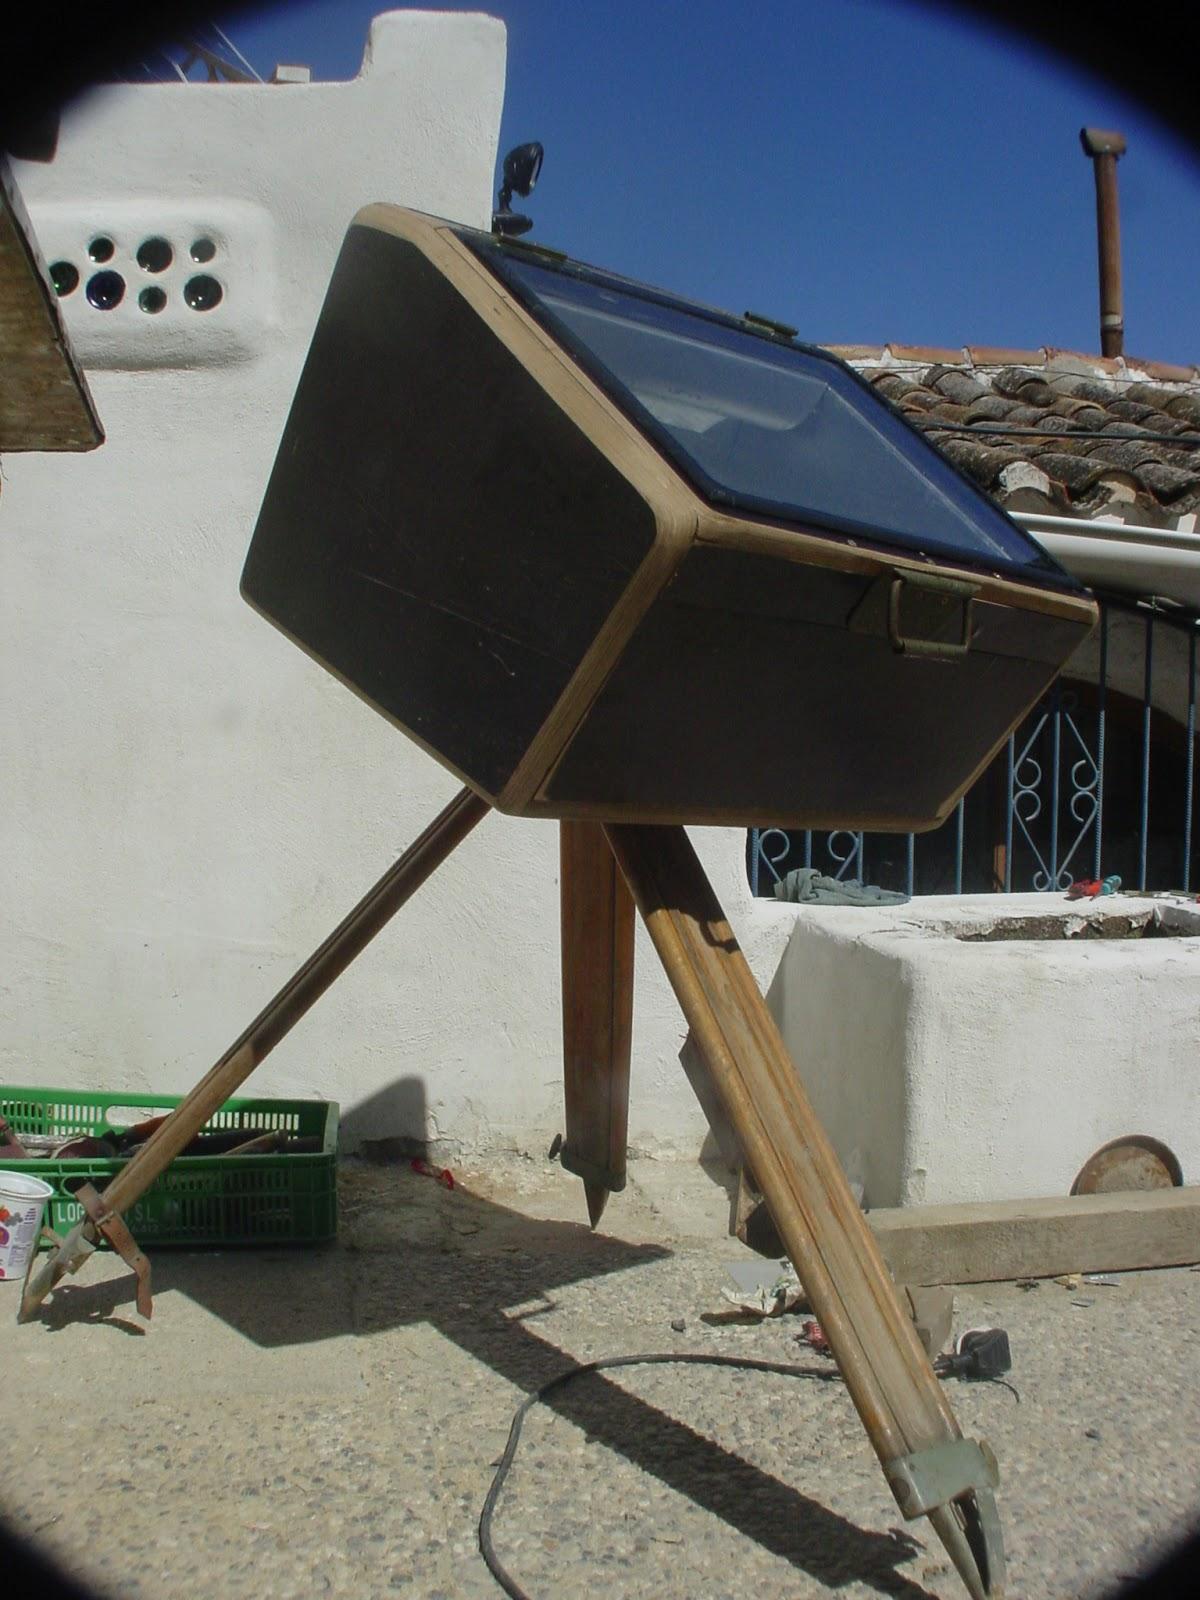 Solar Cooker Diagram Solar Oven Diagram